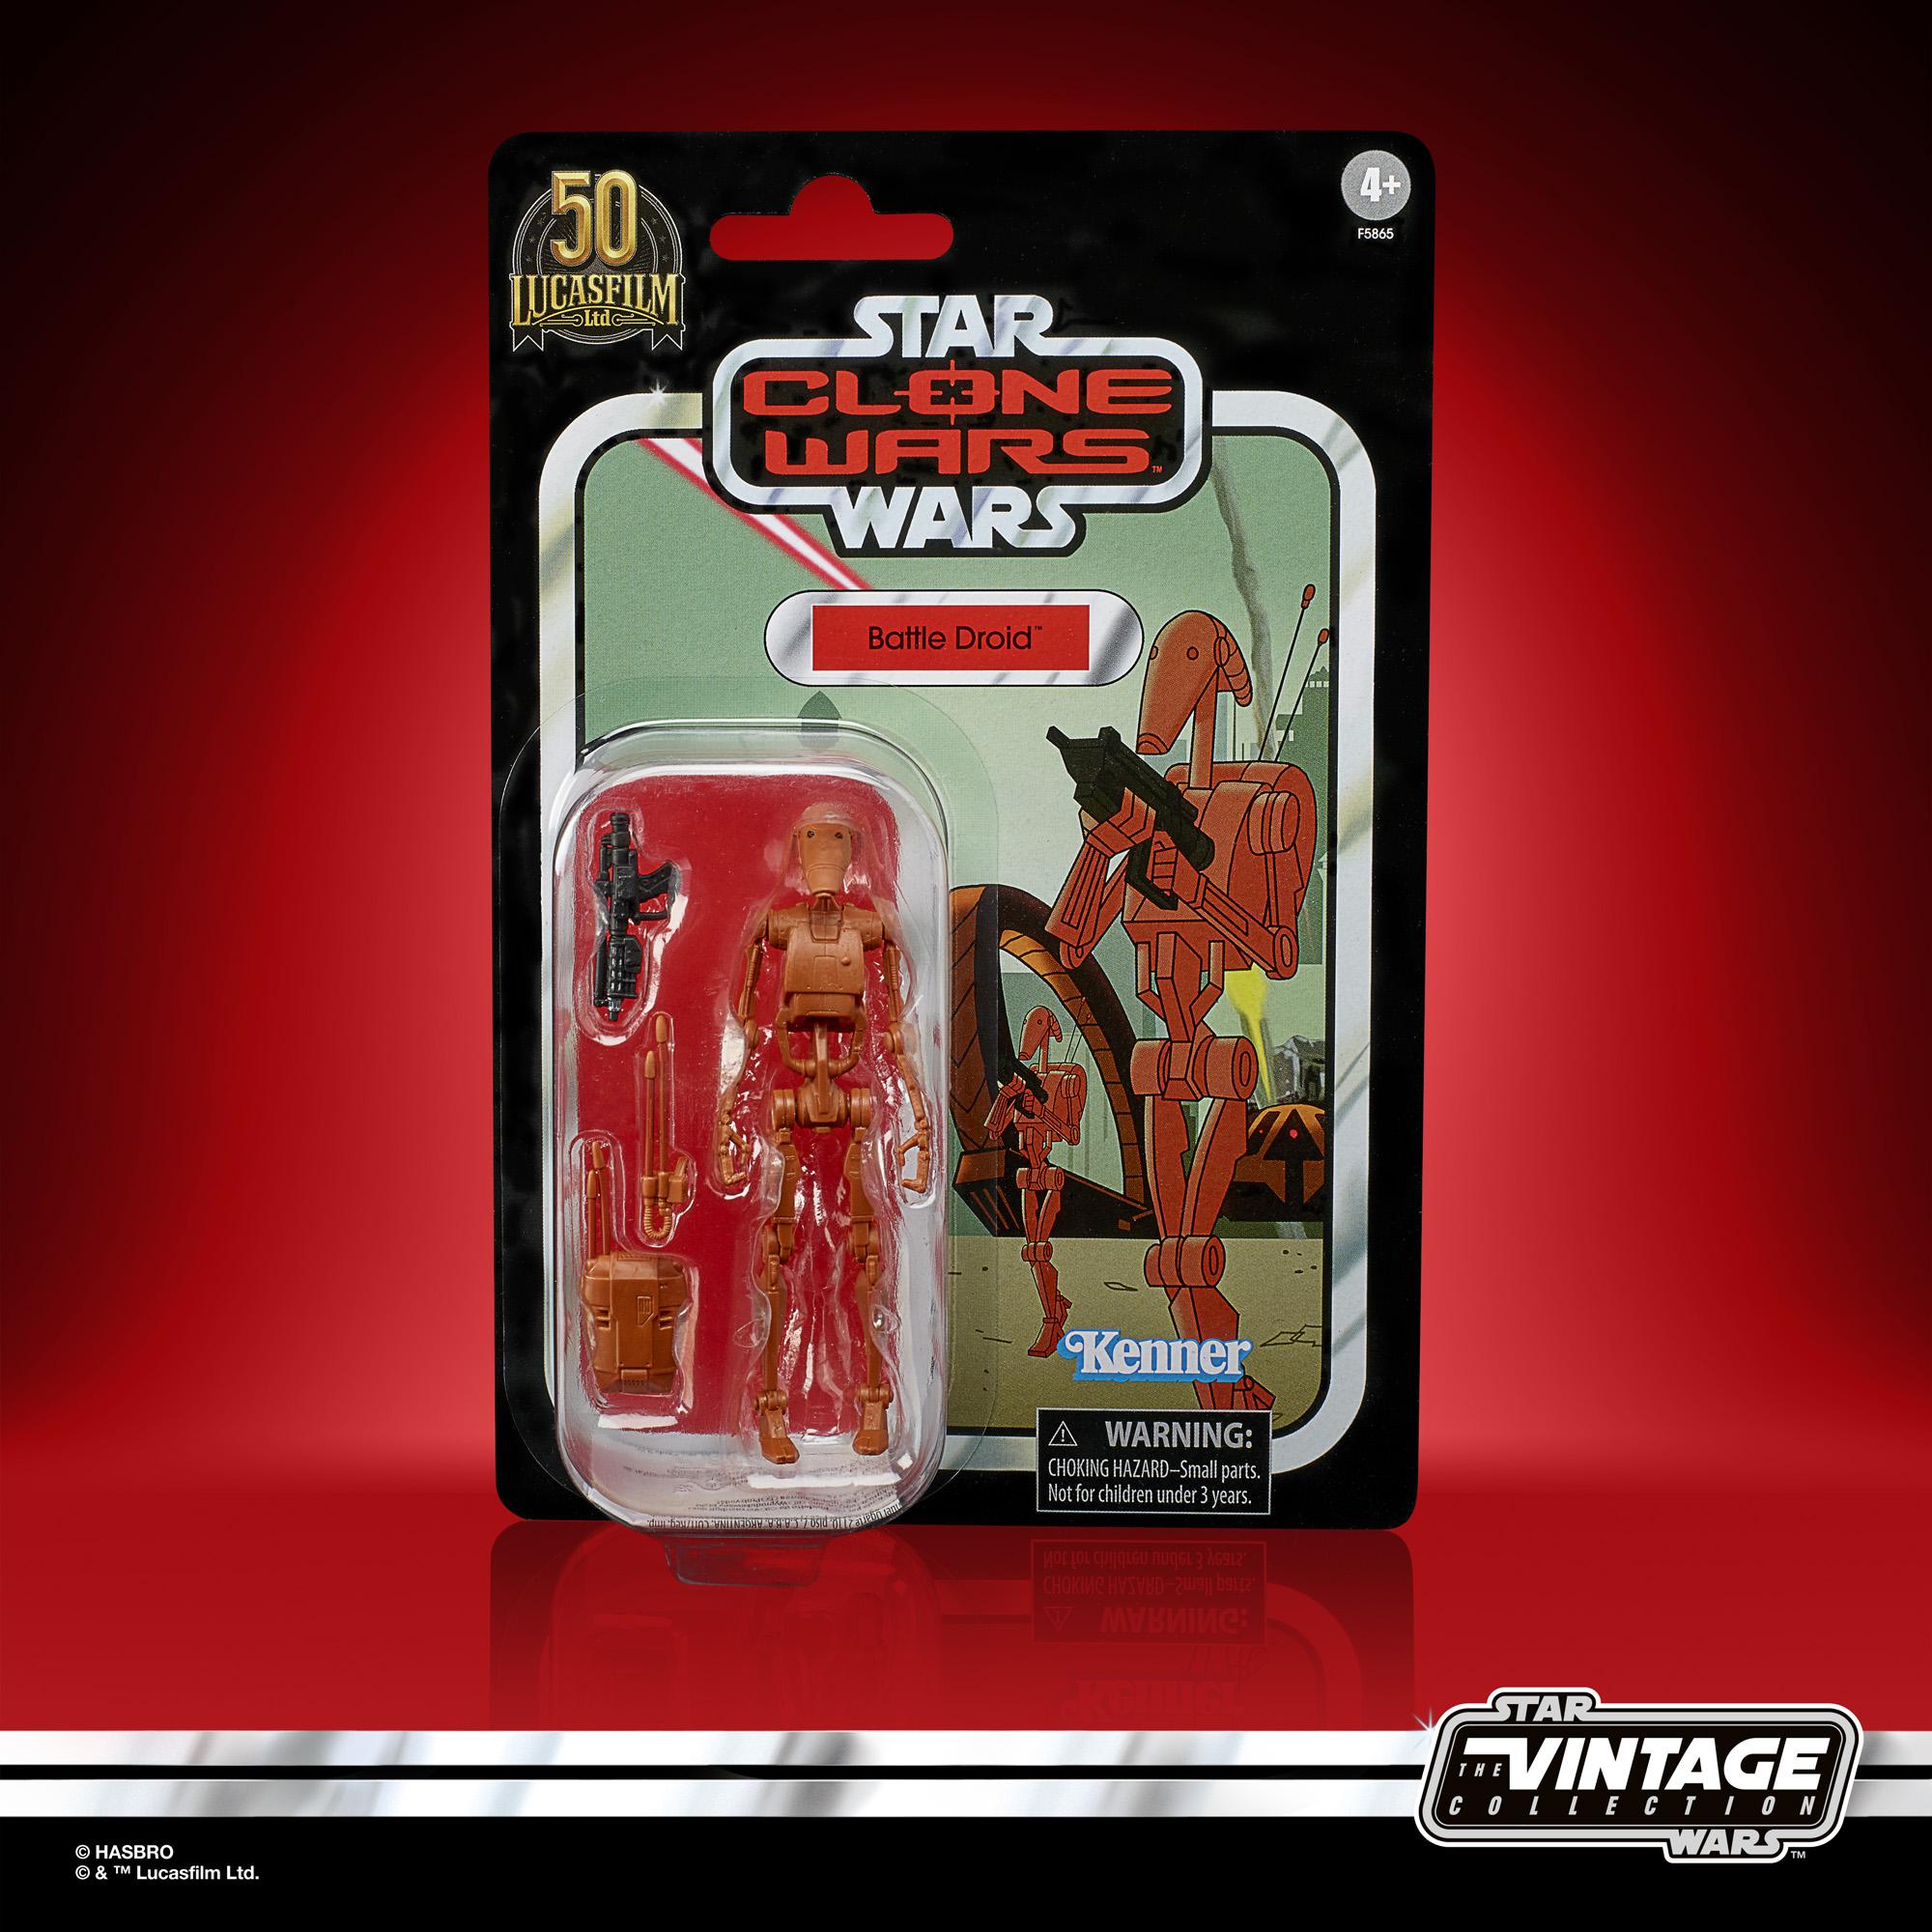 VC-Battle-Droid-TCW-Micro-Lucasfilm-50th-Anniversary-Carded-1.jpg